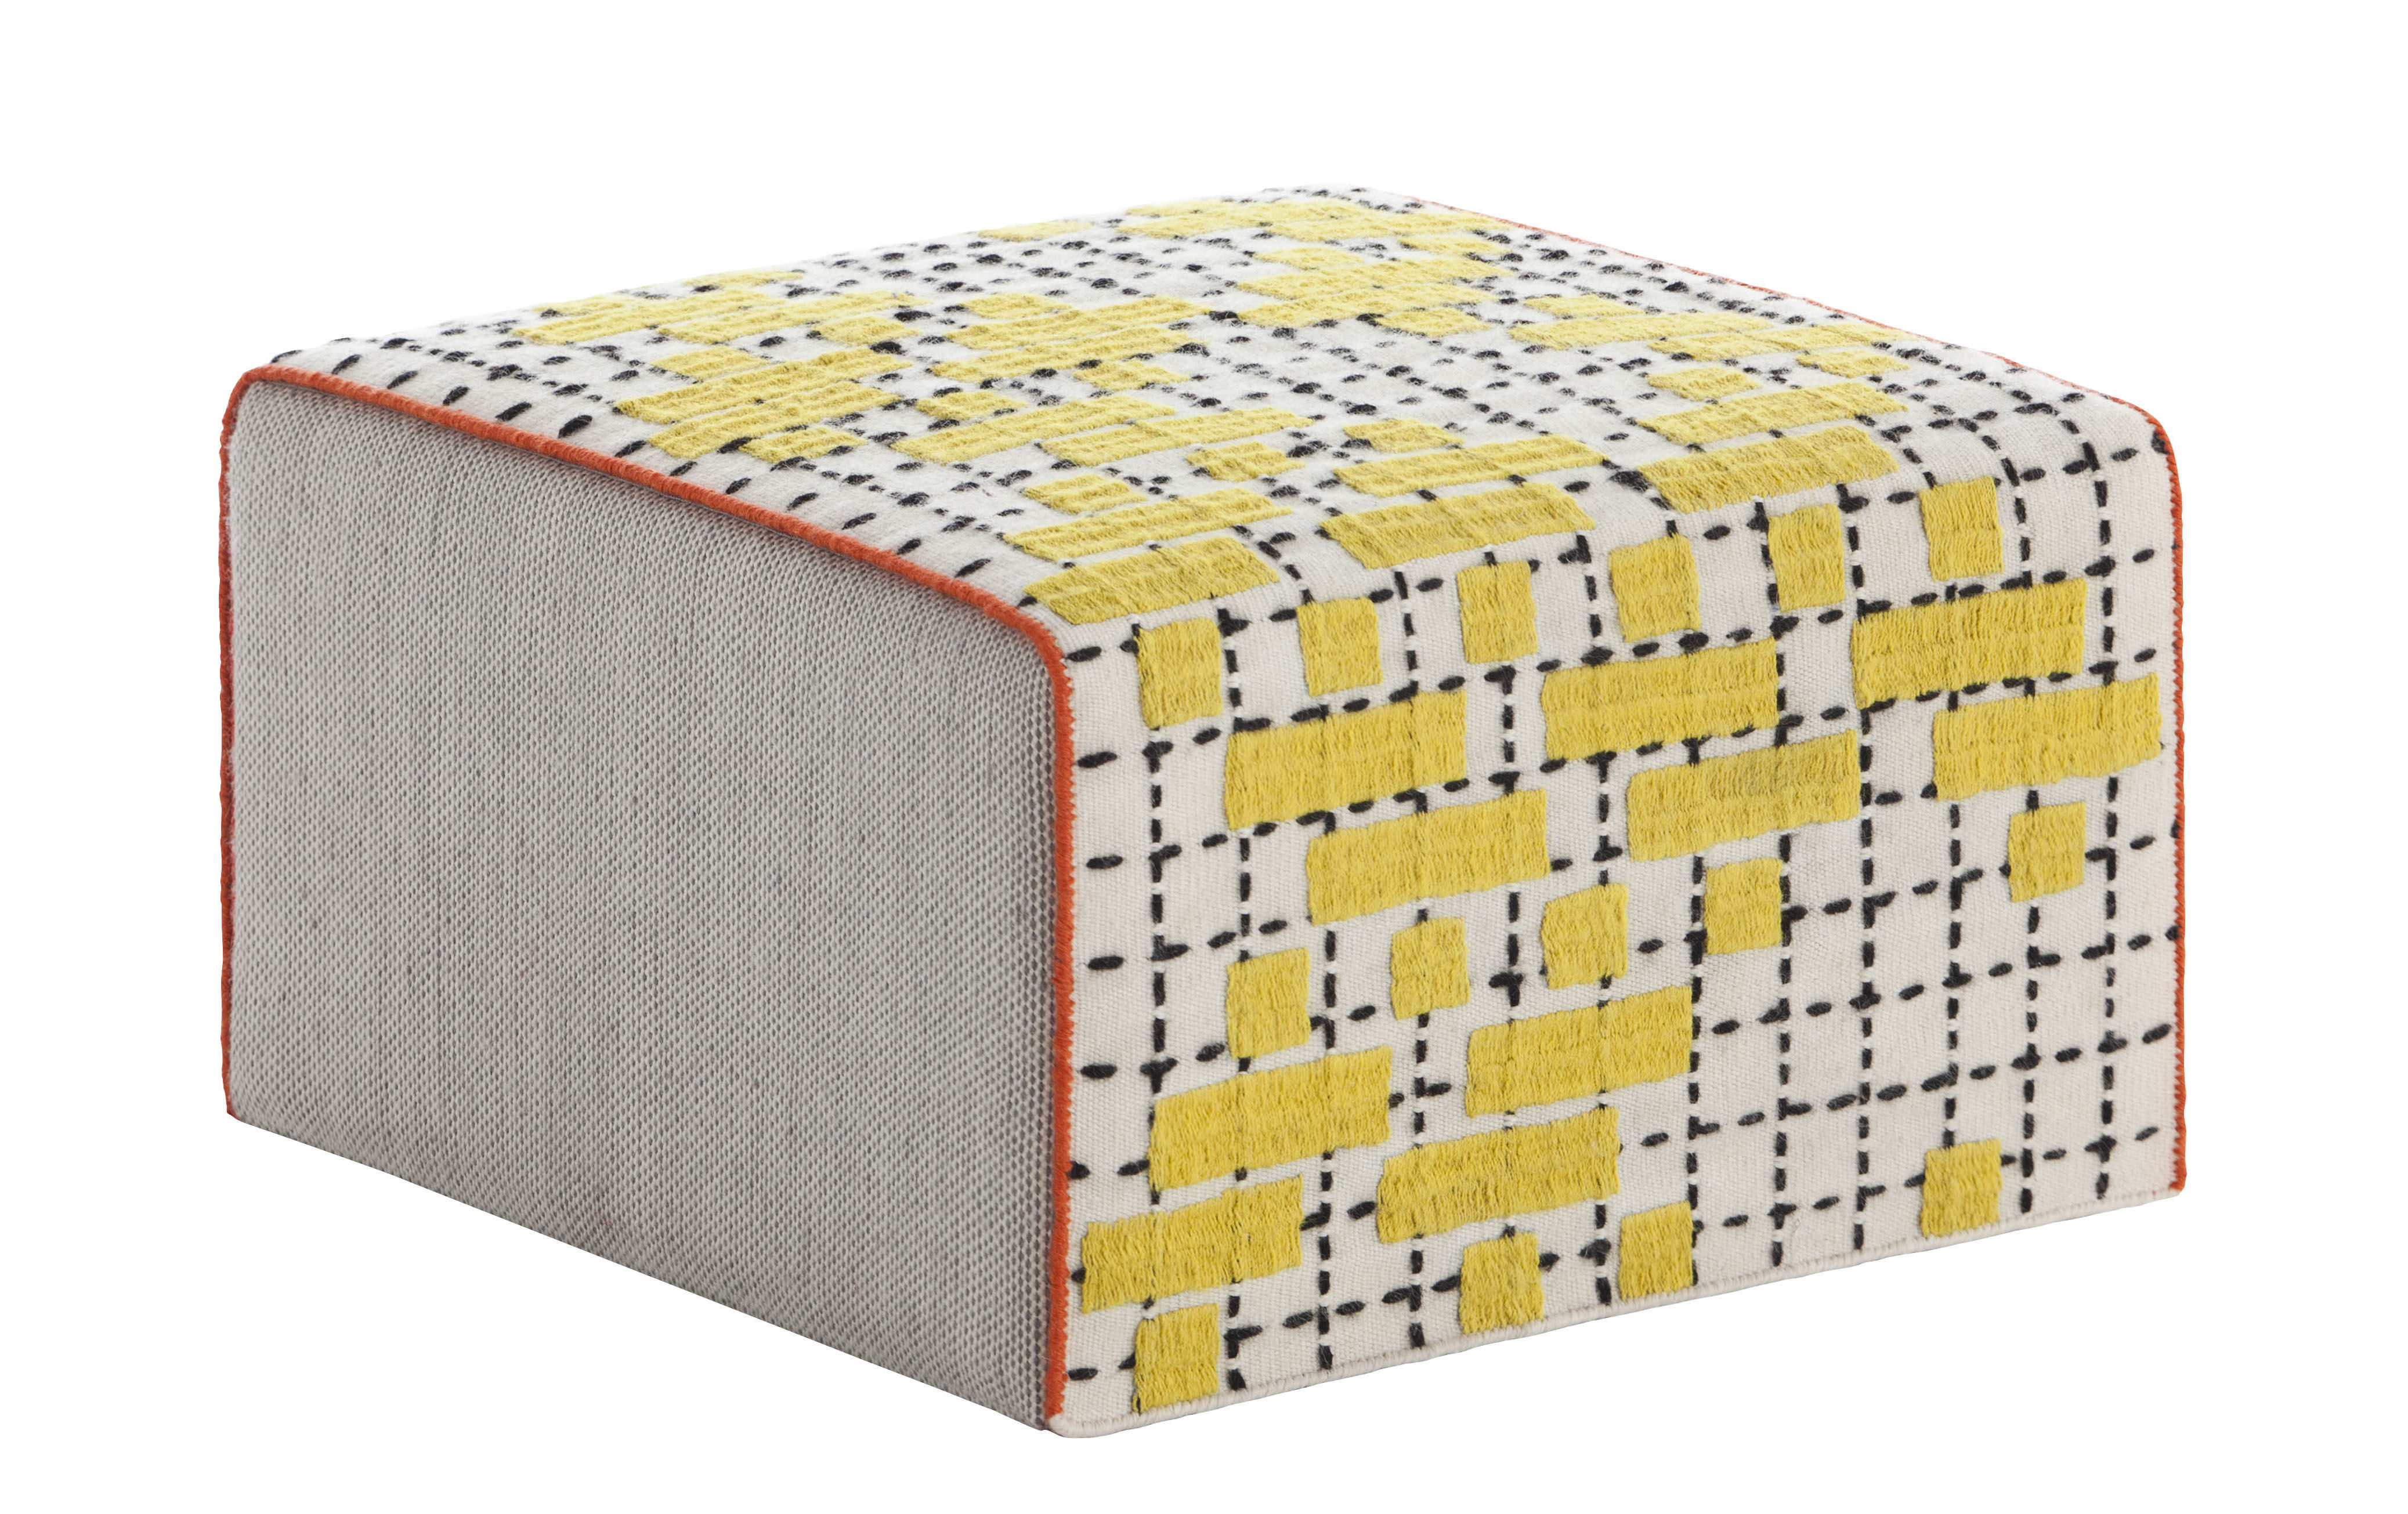 Furniture - Poufs & Floor Cushions - Bandas Small Pouf - 60 x 60 x H 35 cm by Gan - Yellow - Wool